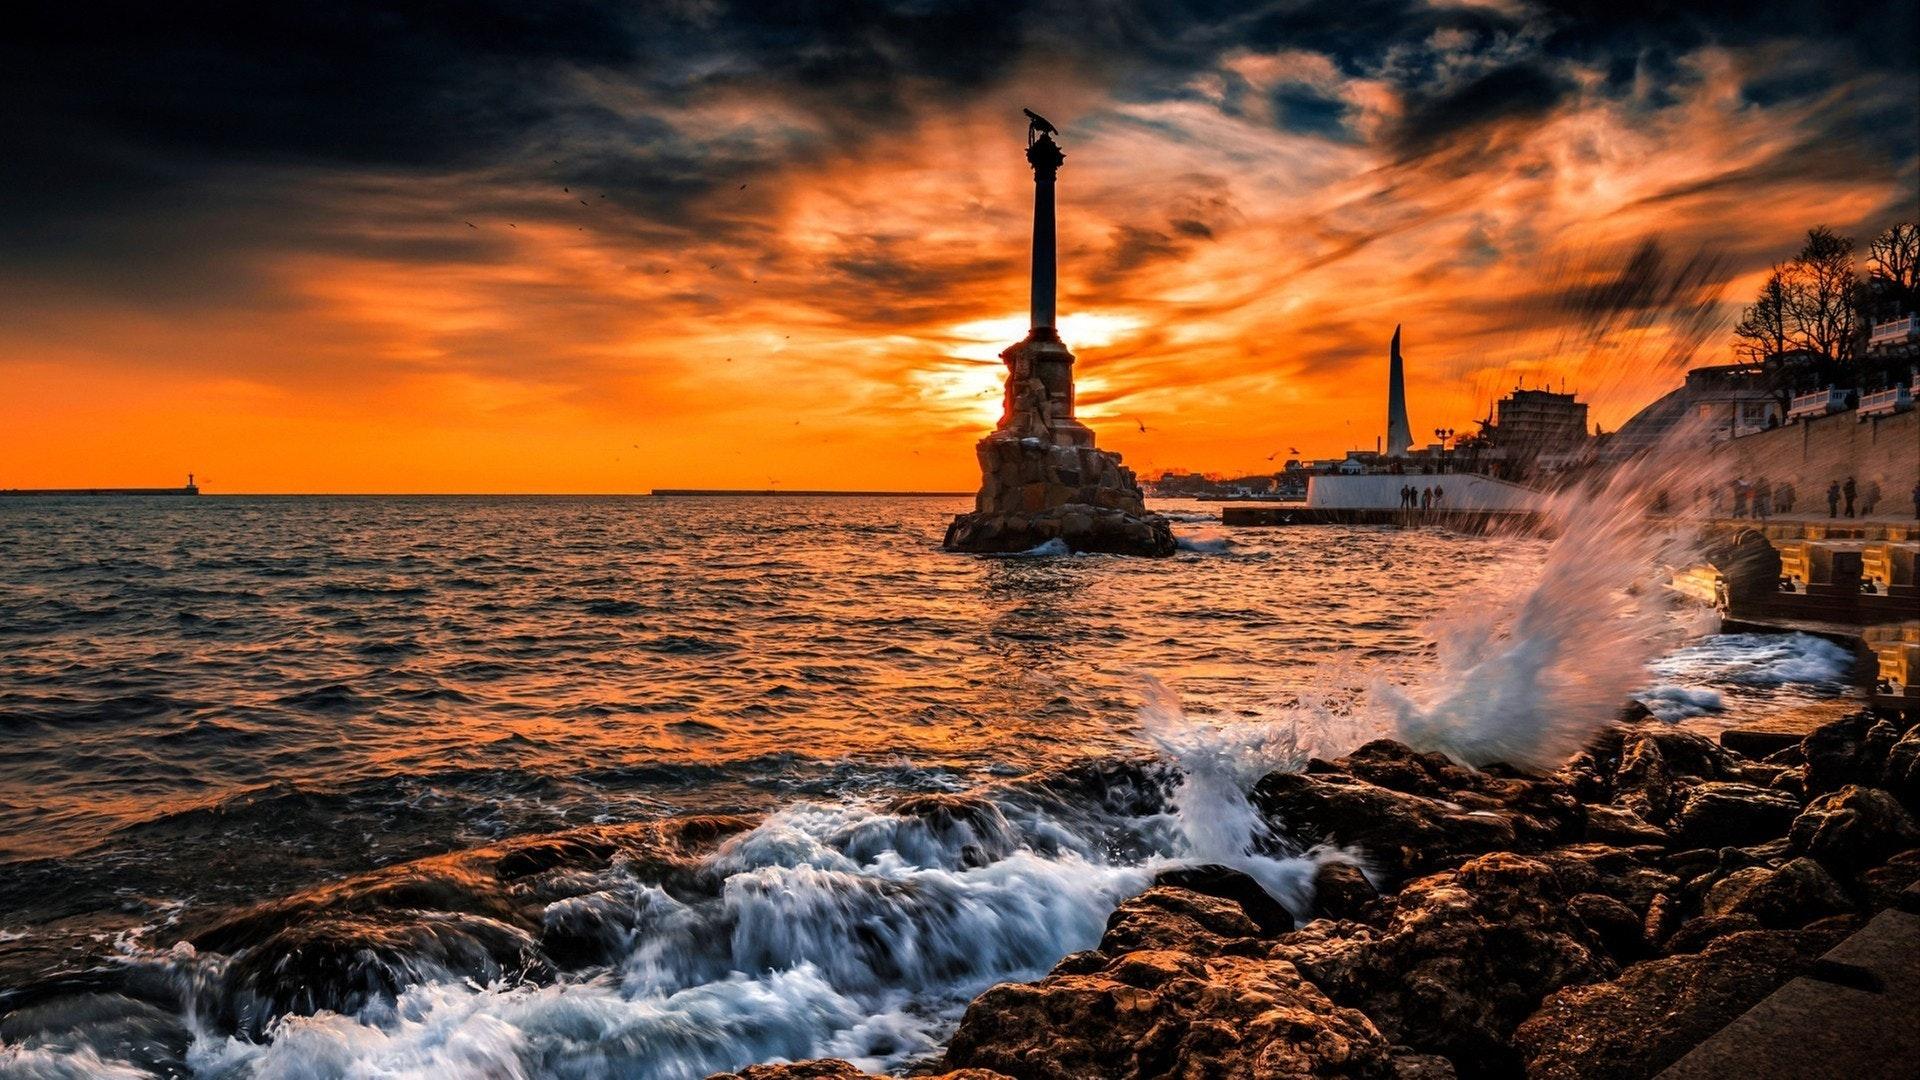 ungesetzt am Berg Seestadt. Sonnenuntergang Schwarzes Meer in Sewastopol, Russland